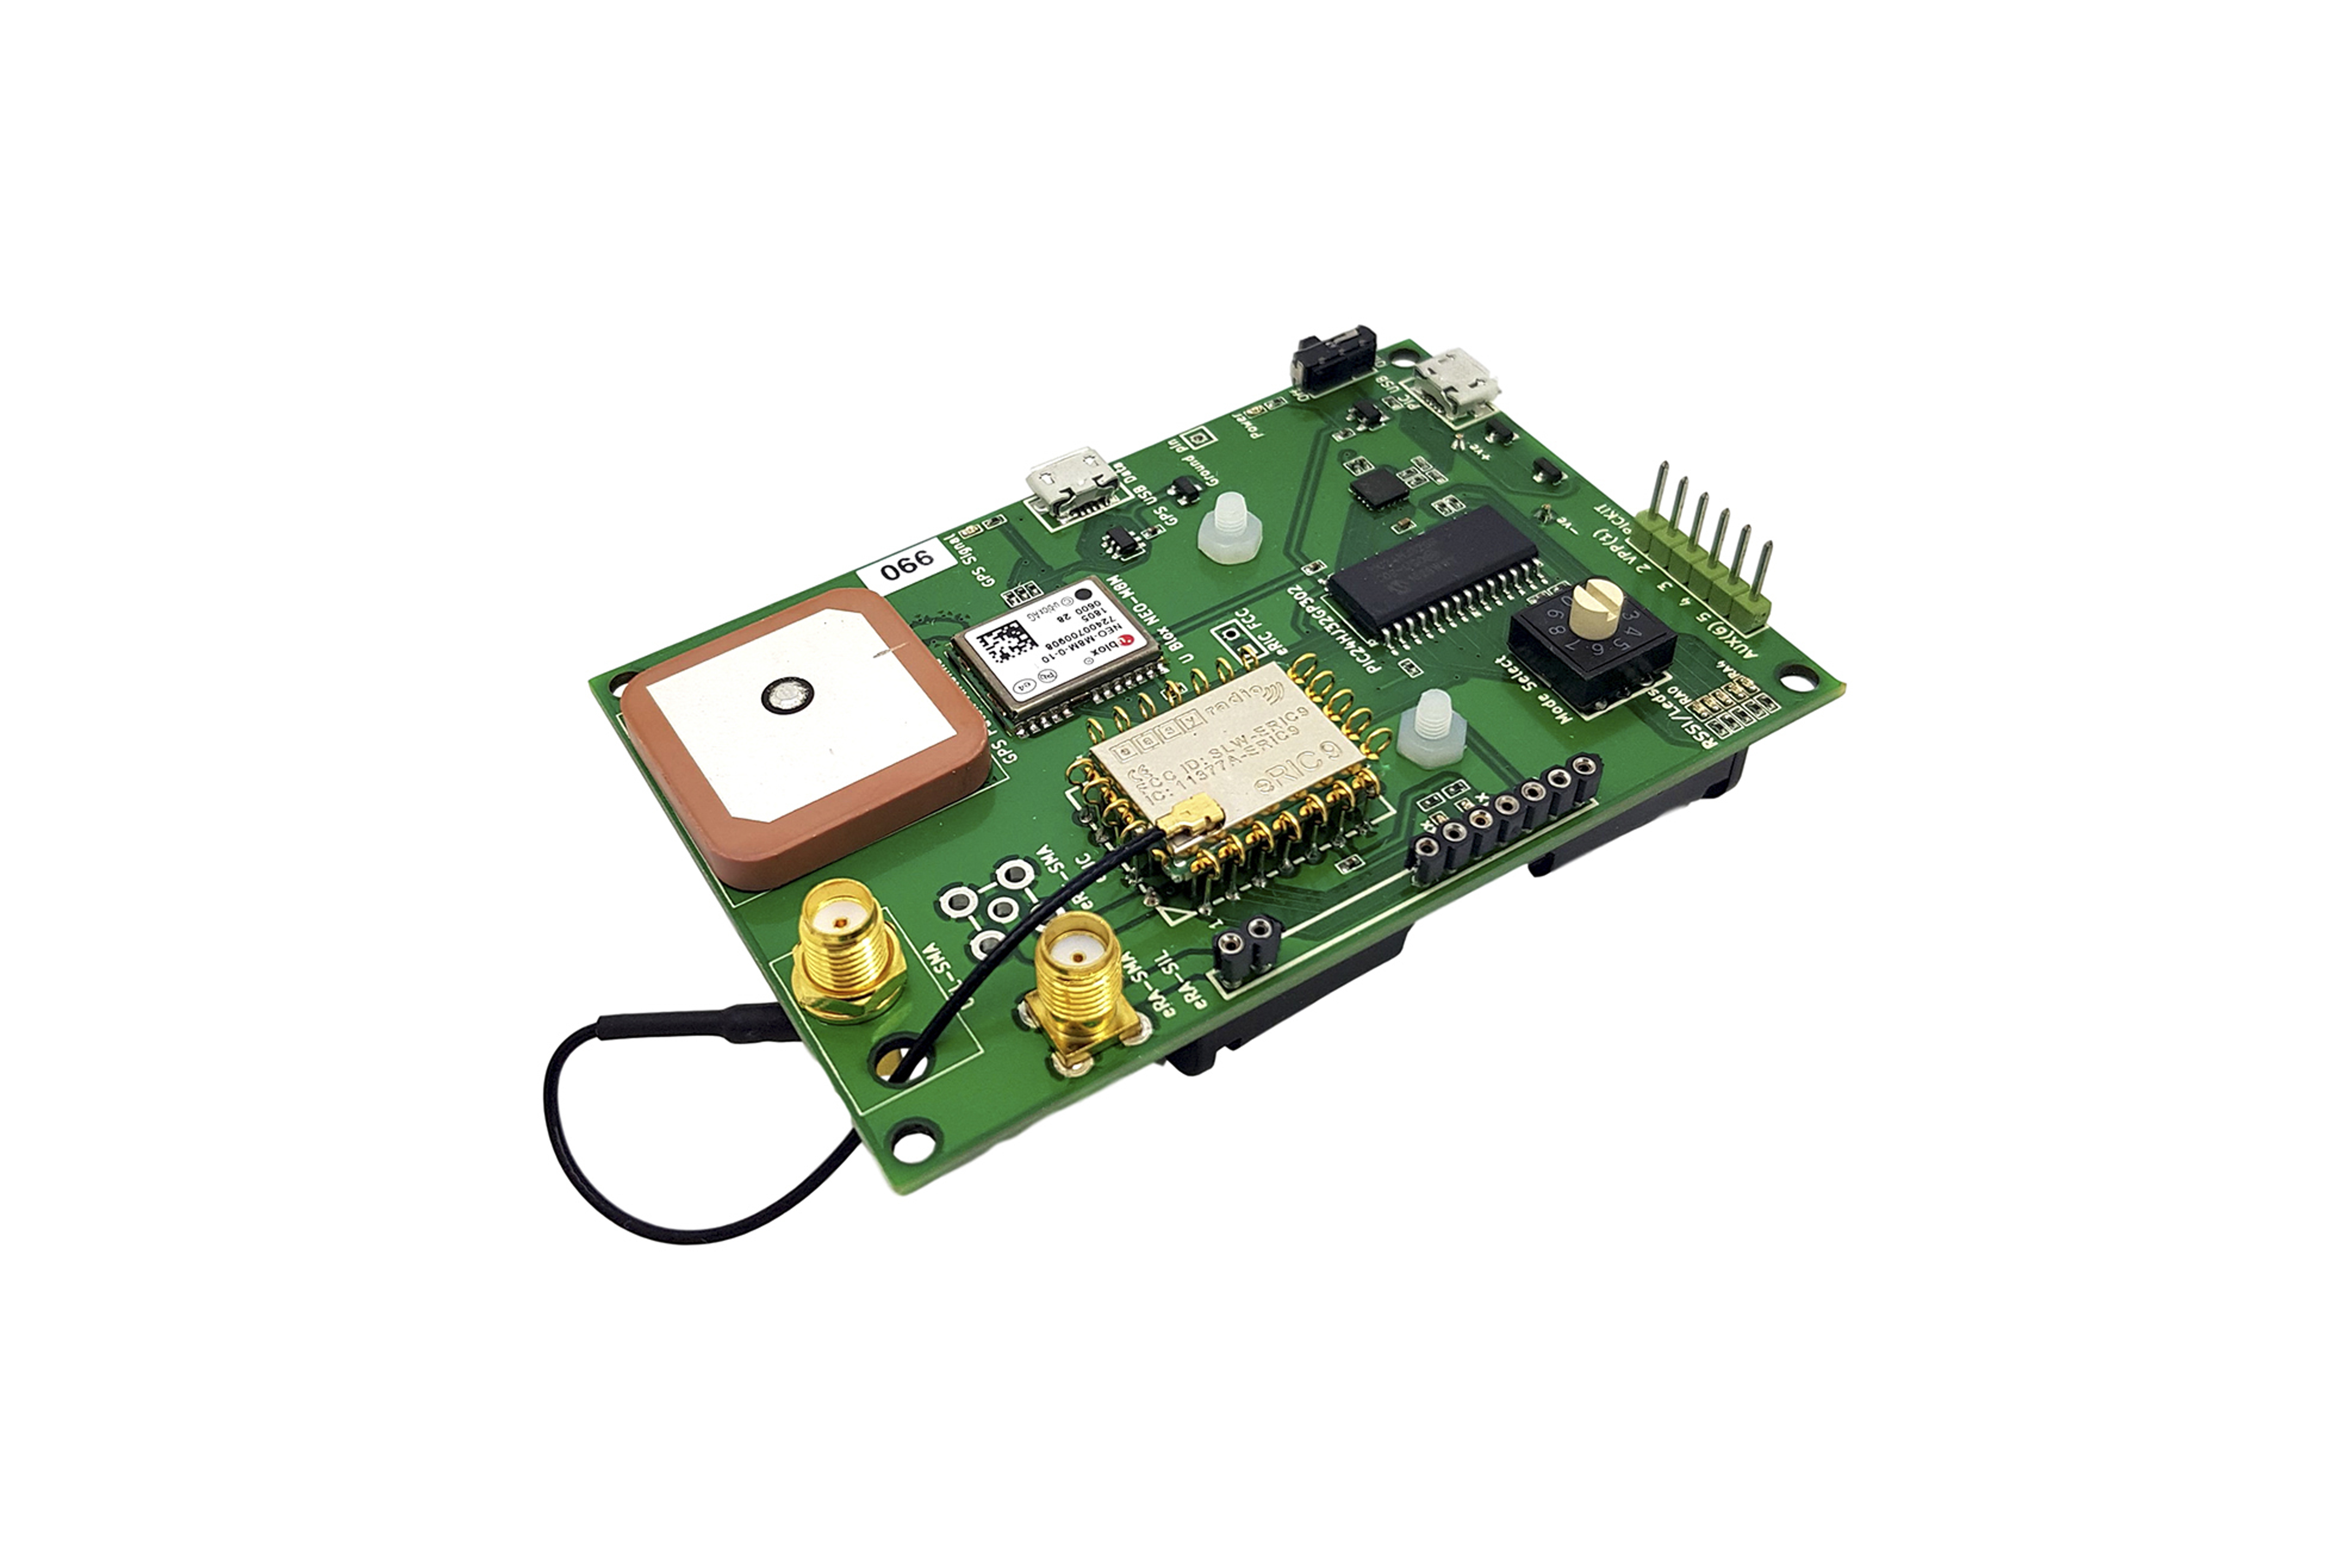 Kit di sviluppo eRIC4/9/LoRainc GPS